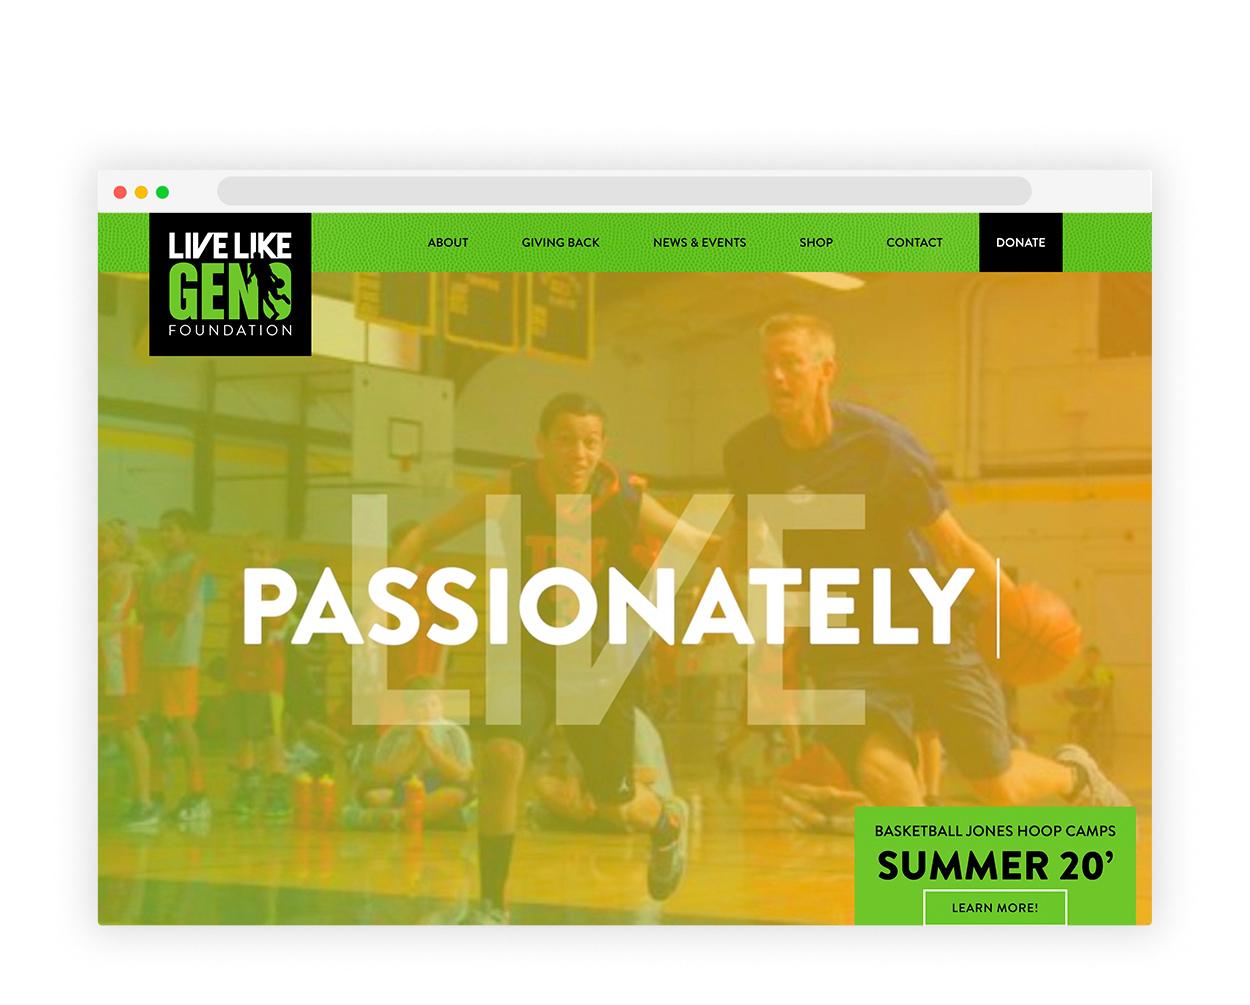 Live Like Geno Foundation